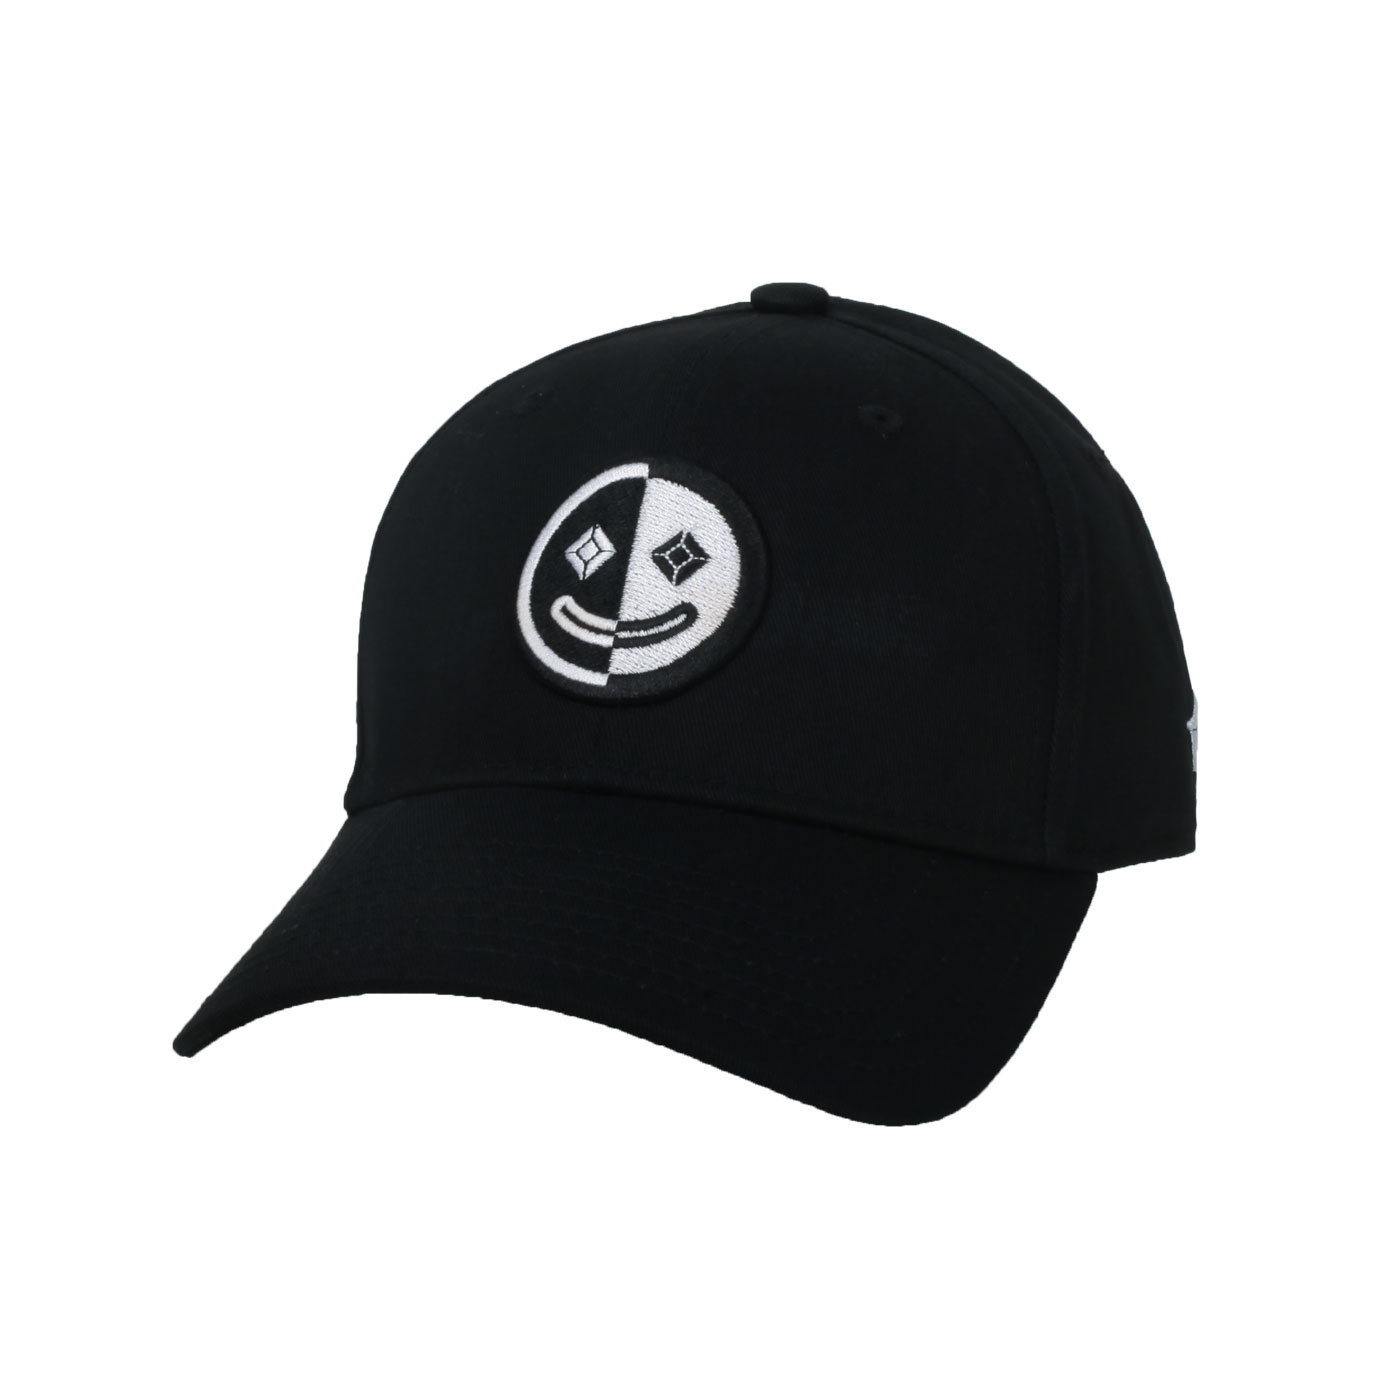 KAPPA DD52聯名球帽 35151EW-005 - 黑白